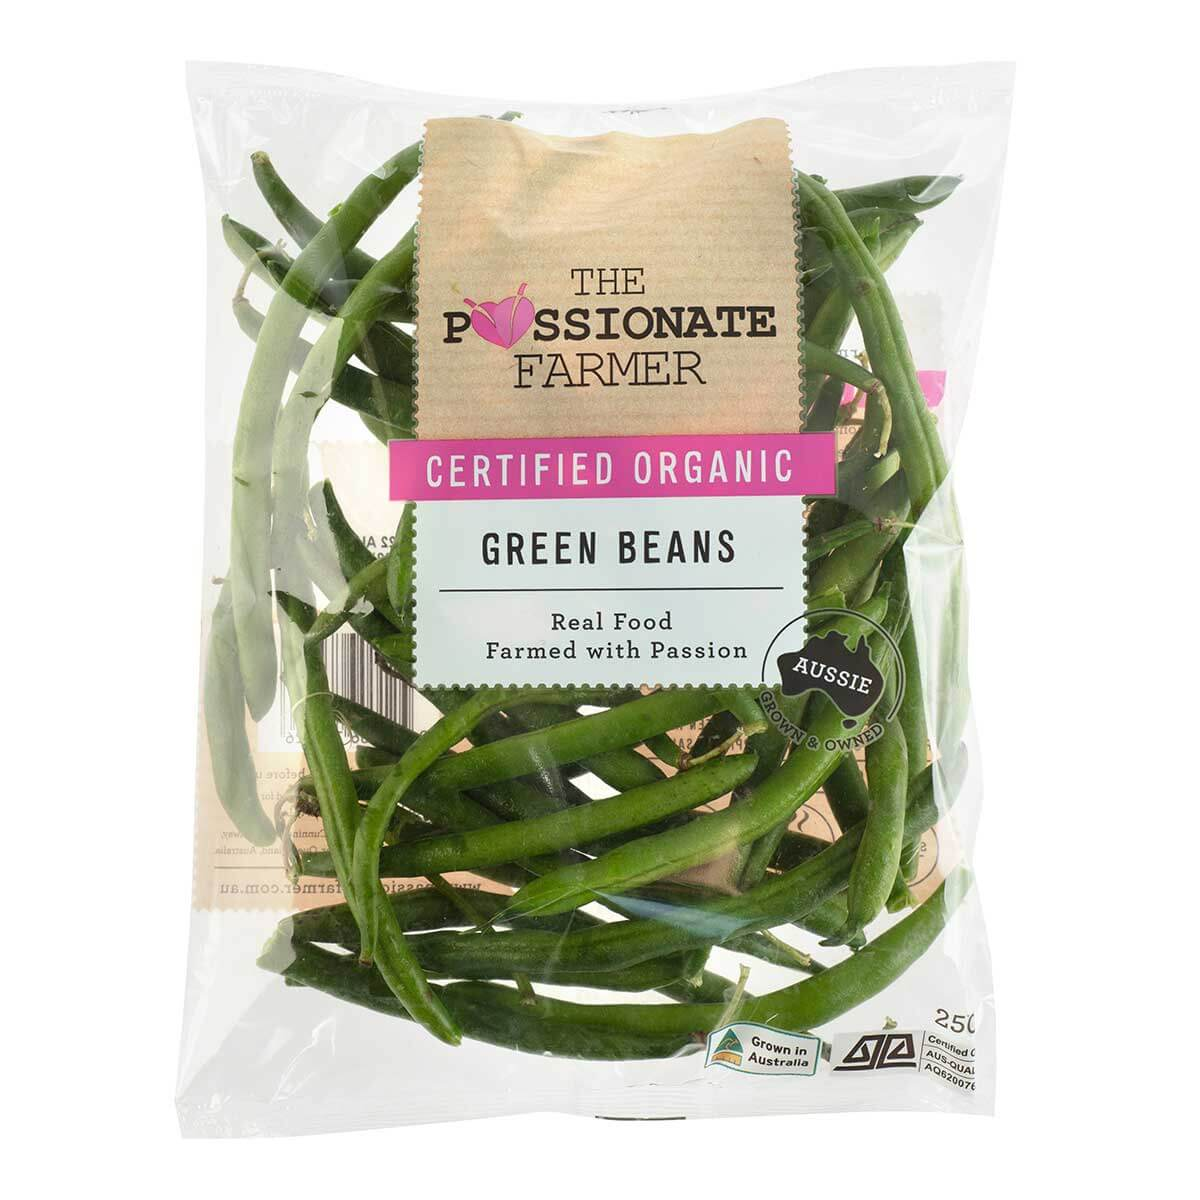 passionate-farmer-organic-green-beans